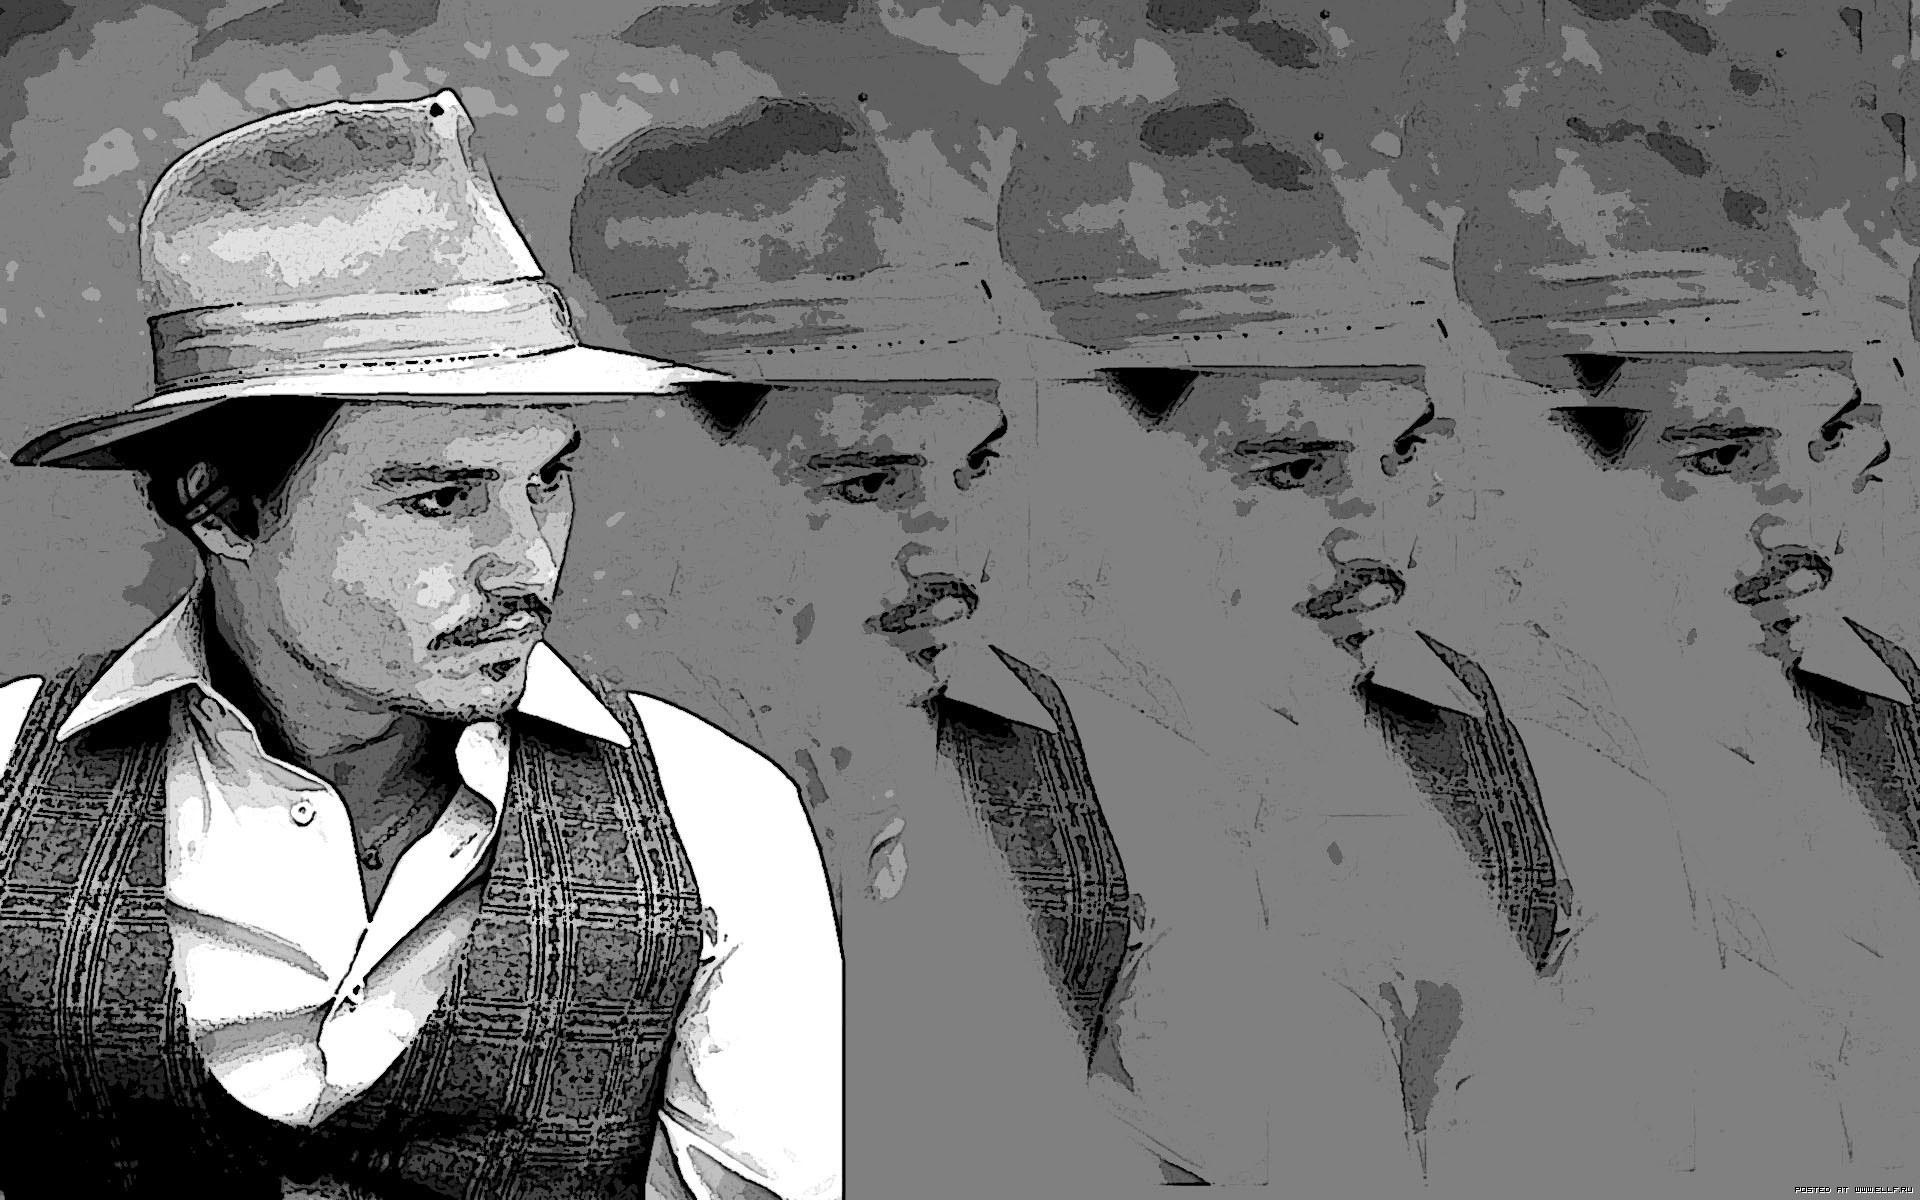 Джонни Дэпп, киноактер, шляпа